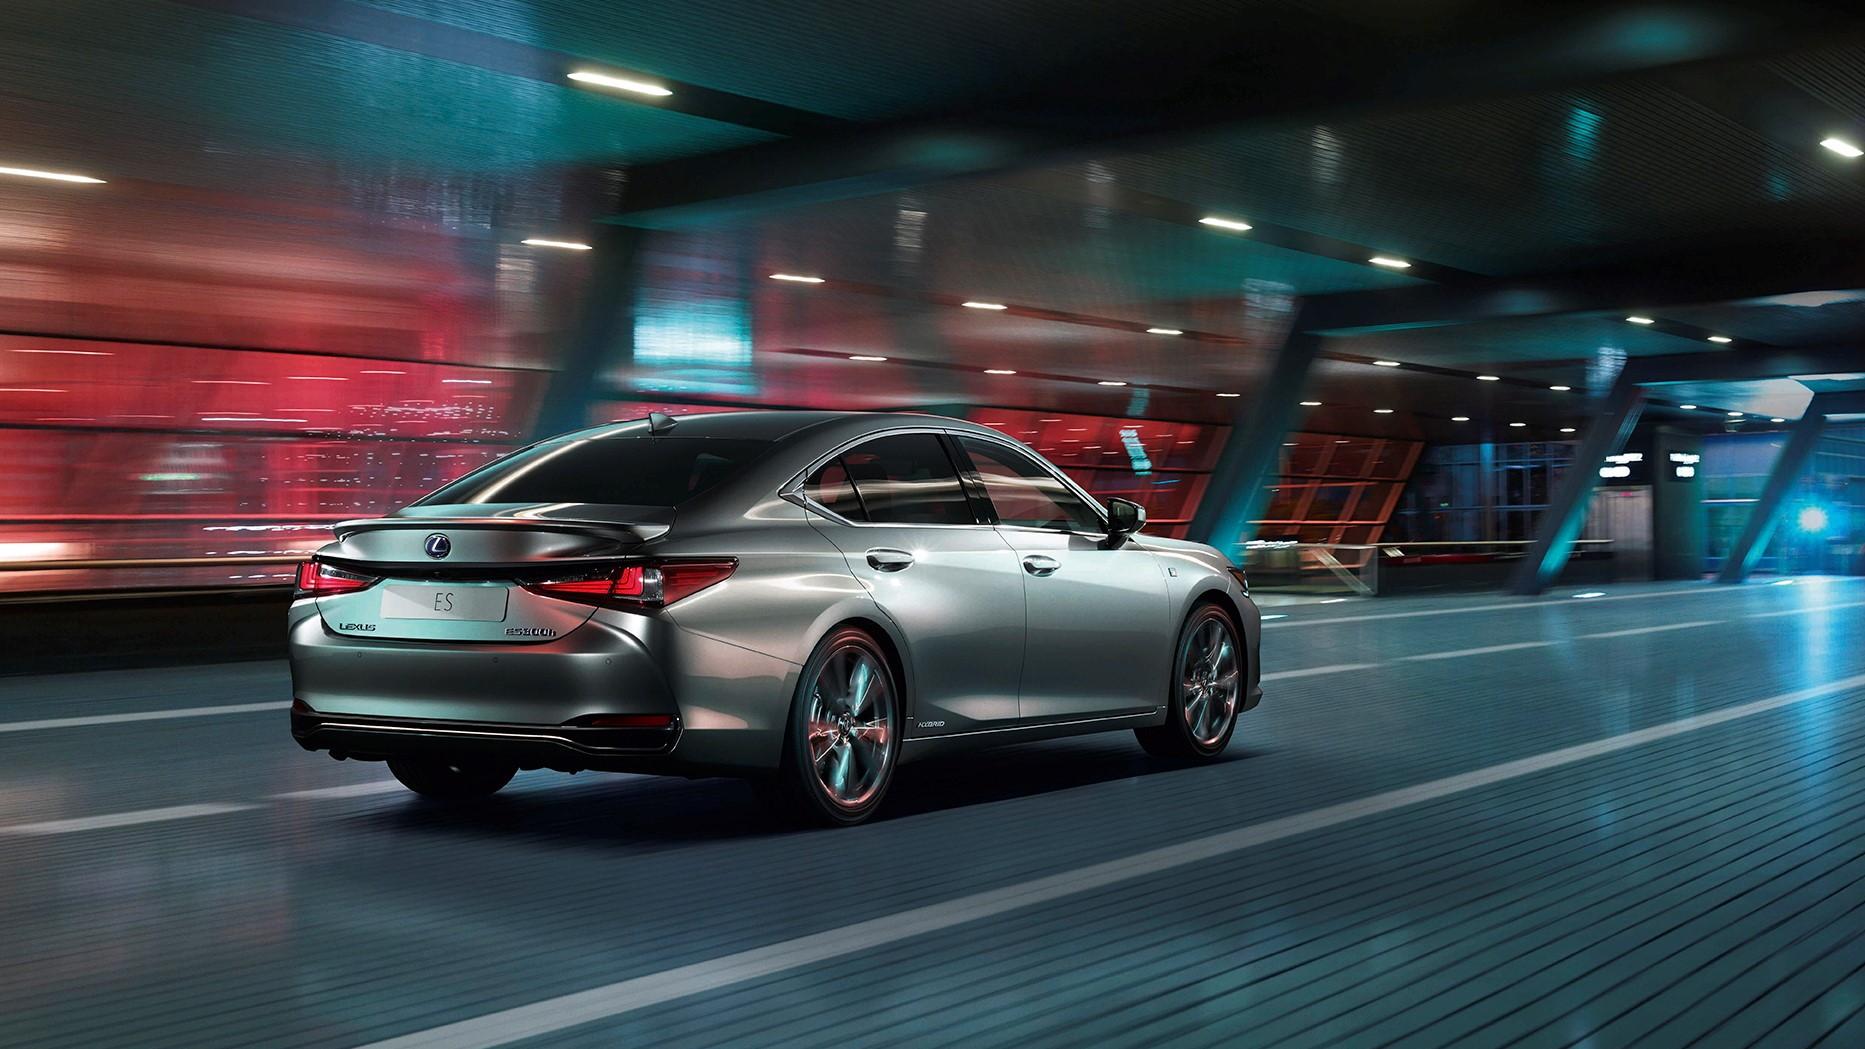 2019 Lexus Es Revealed Features 44 Mpg 300h Hybrid Sedan